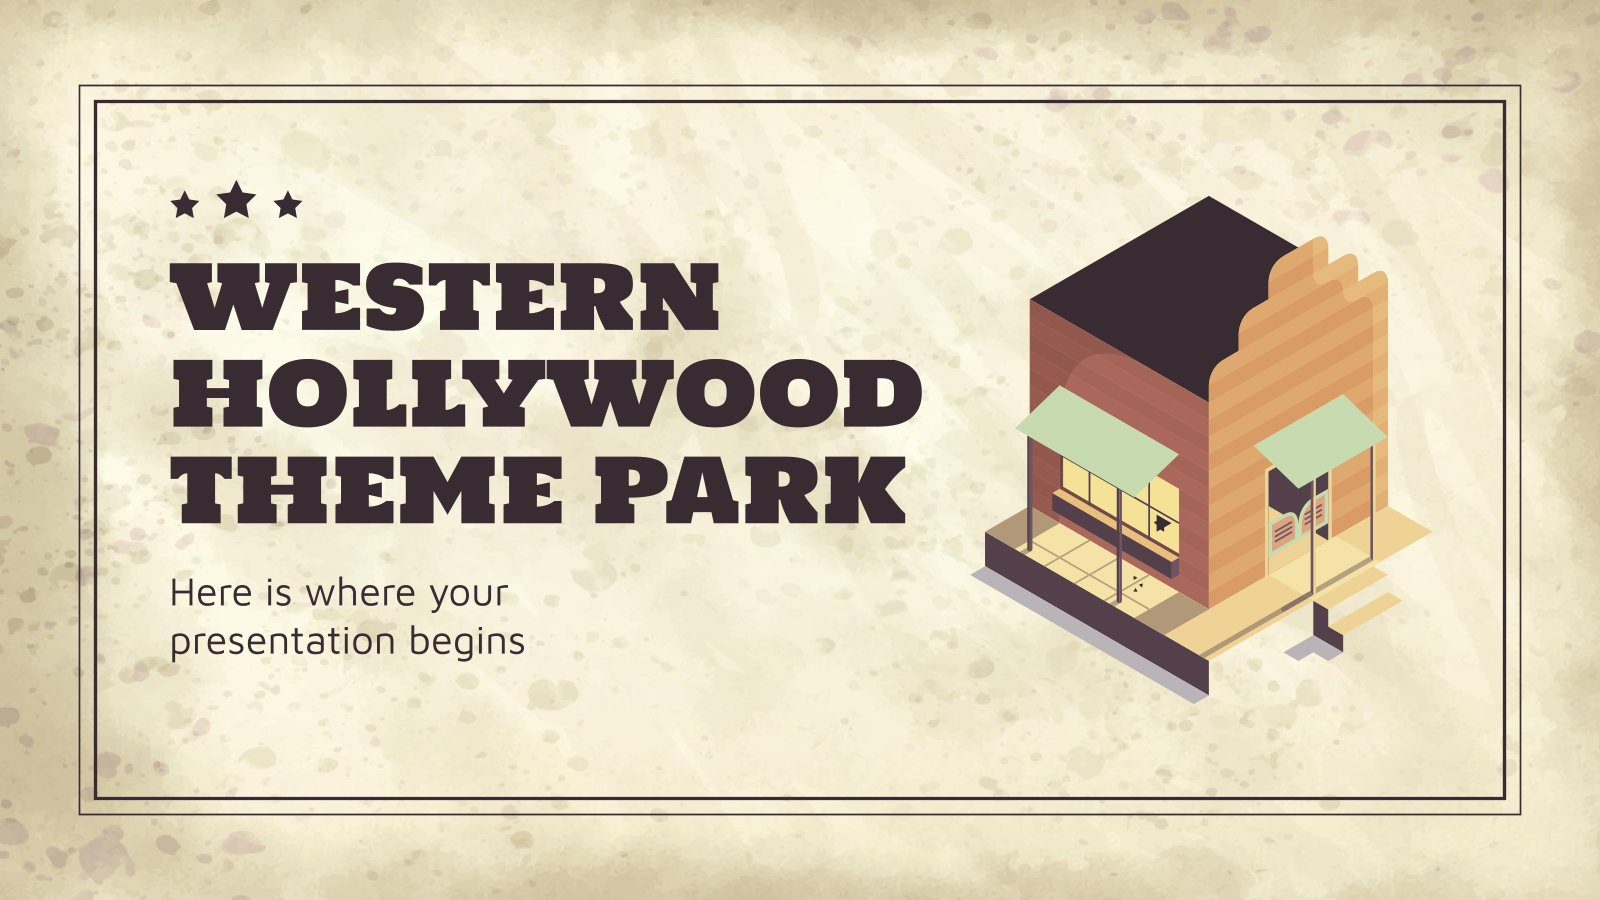 Western Hollywood Theme Park Minithema Präsentationsvorlage